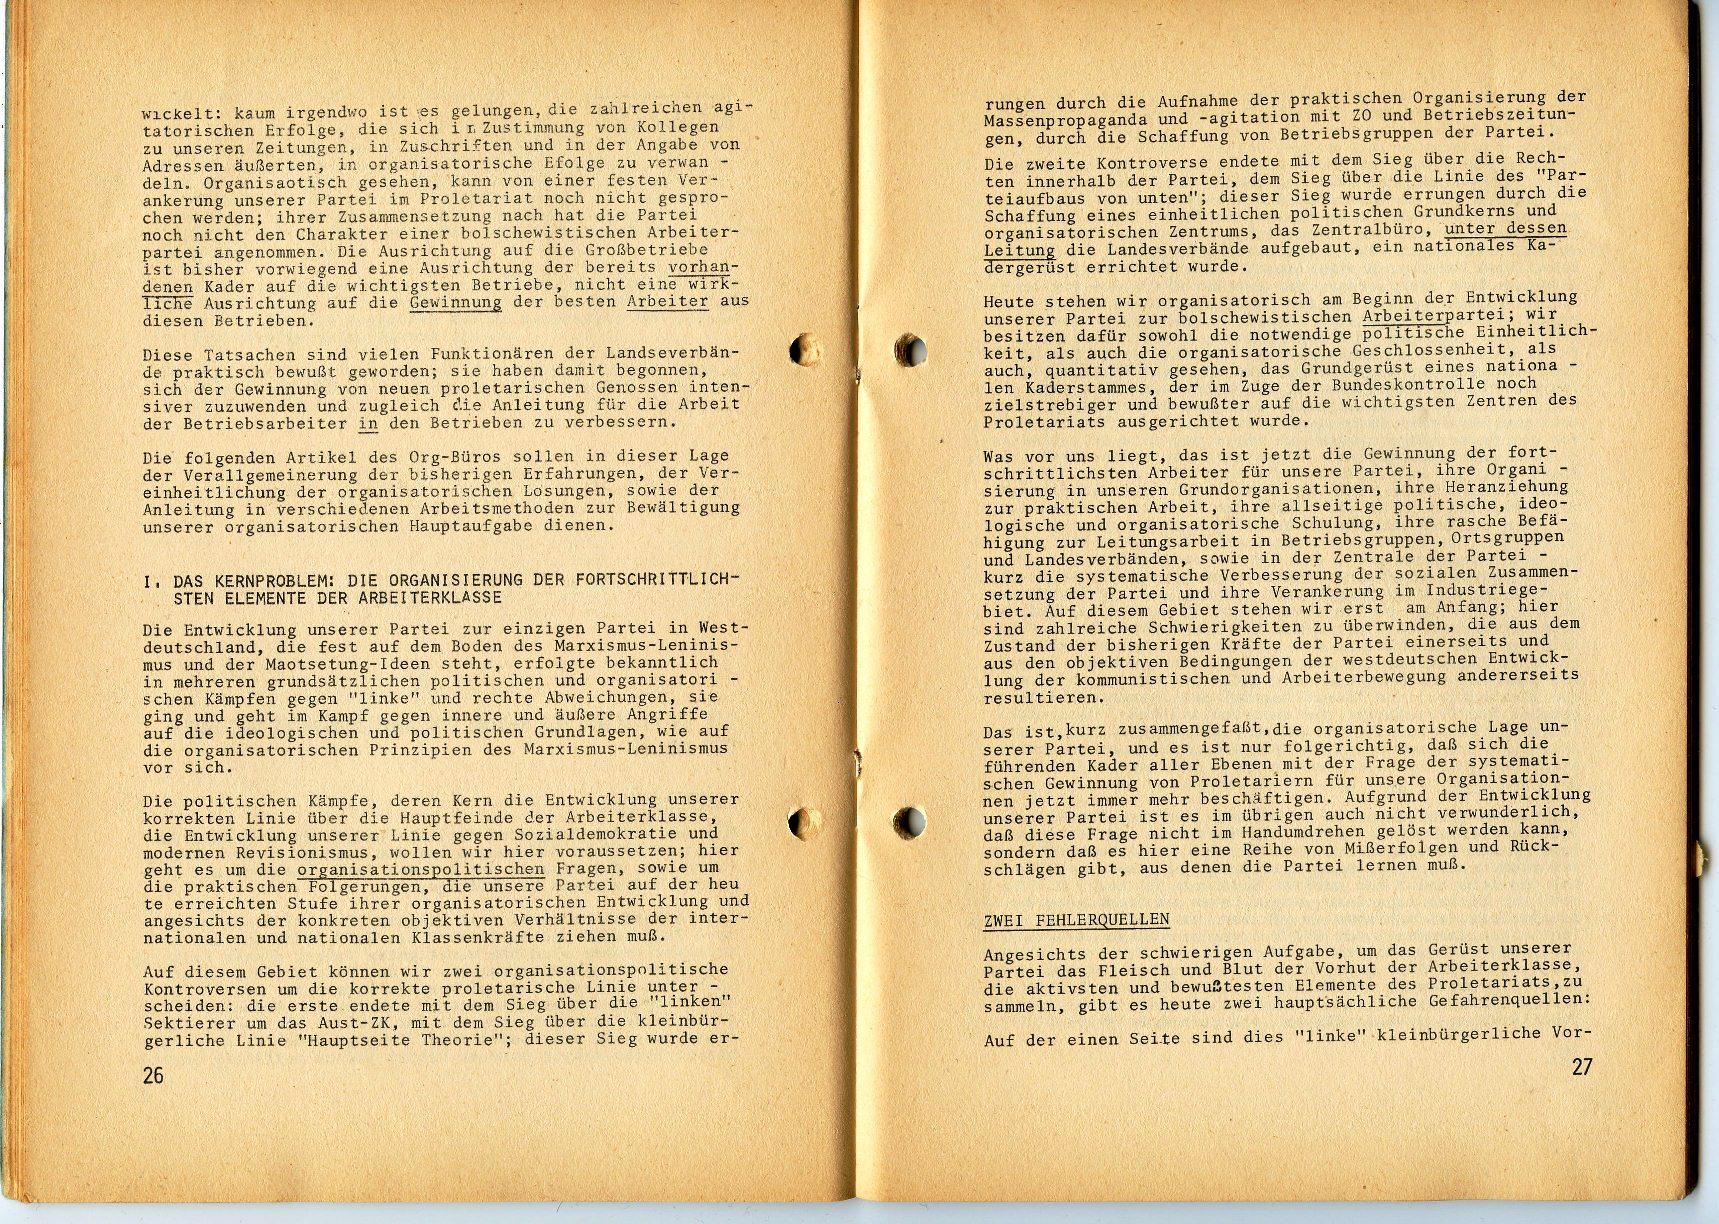 ZB_Parteiarbeiter_1971_04_14